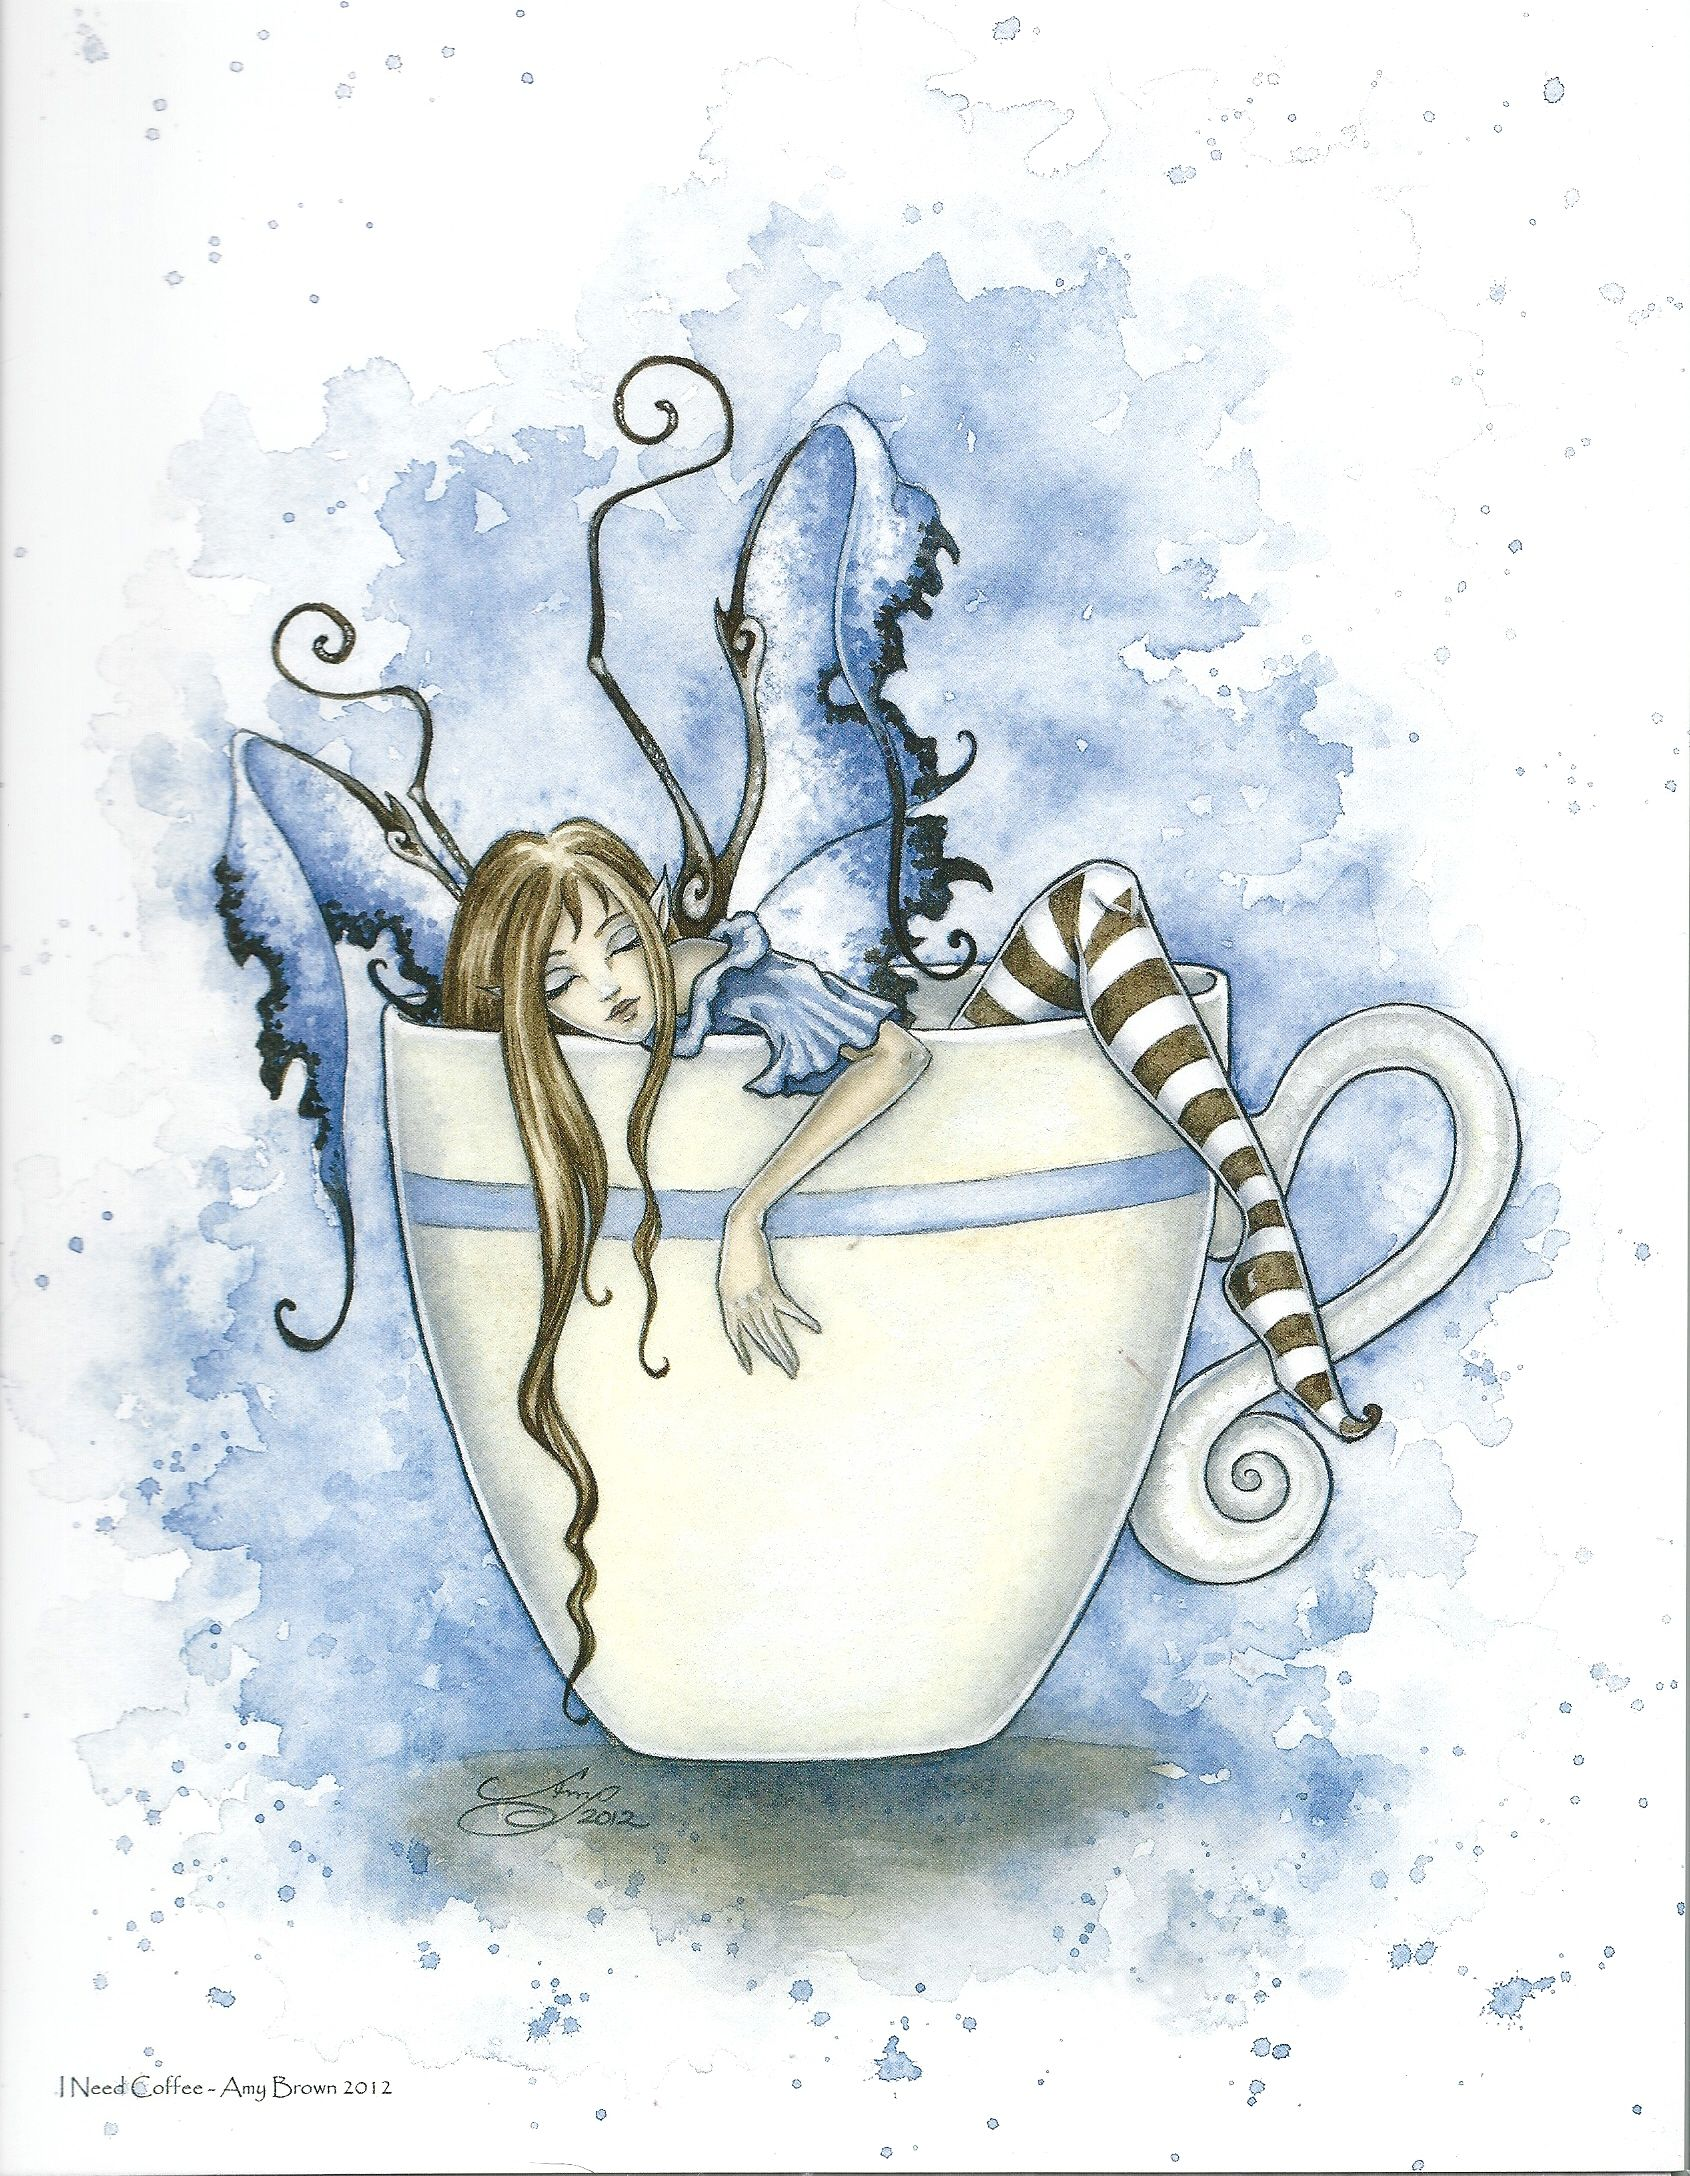 Amy Brown I Need Coffee Fairy/Faery, Print #fantasyart  #amybrown #coffeeandtea - EXACTLY how I feel in the morning!